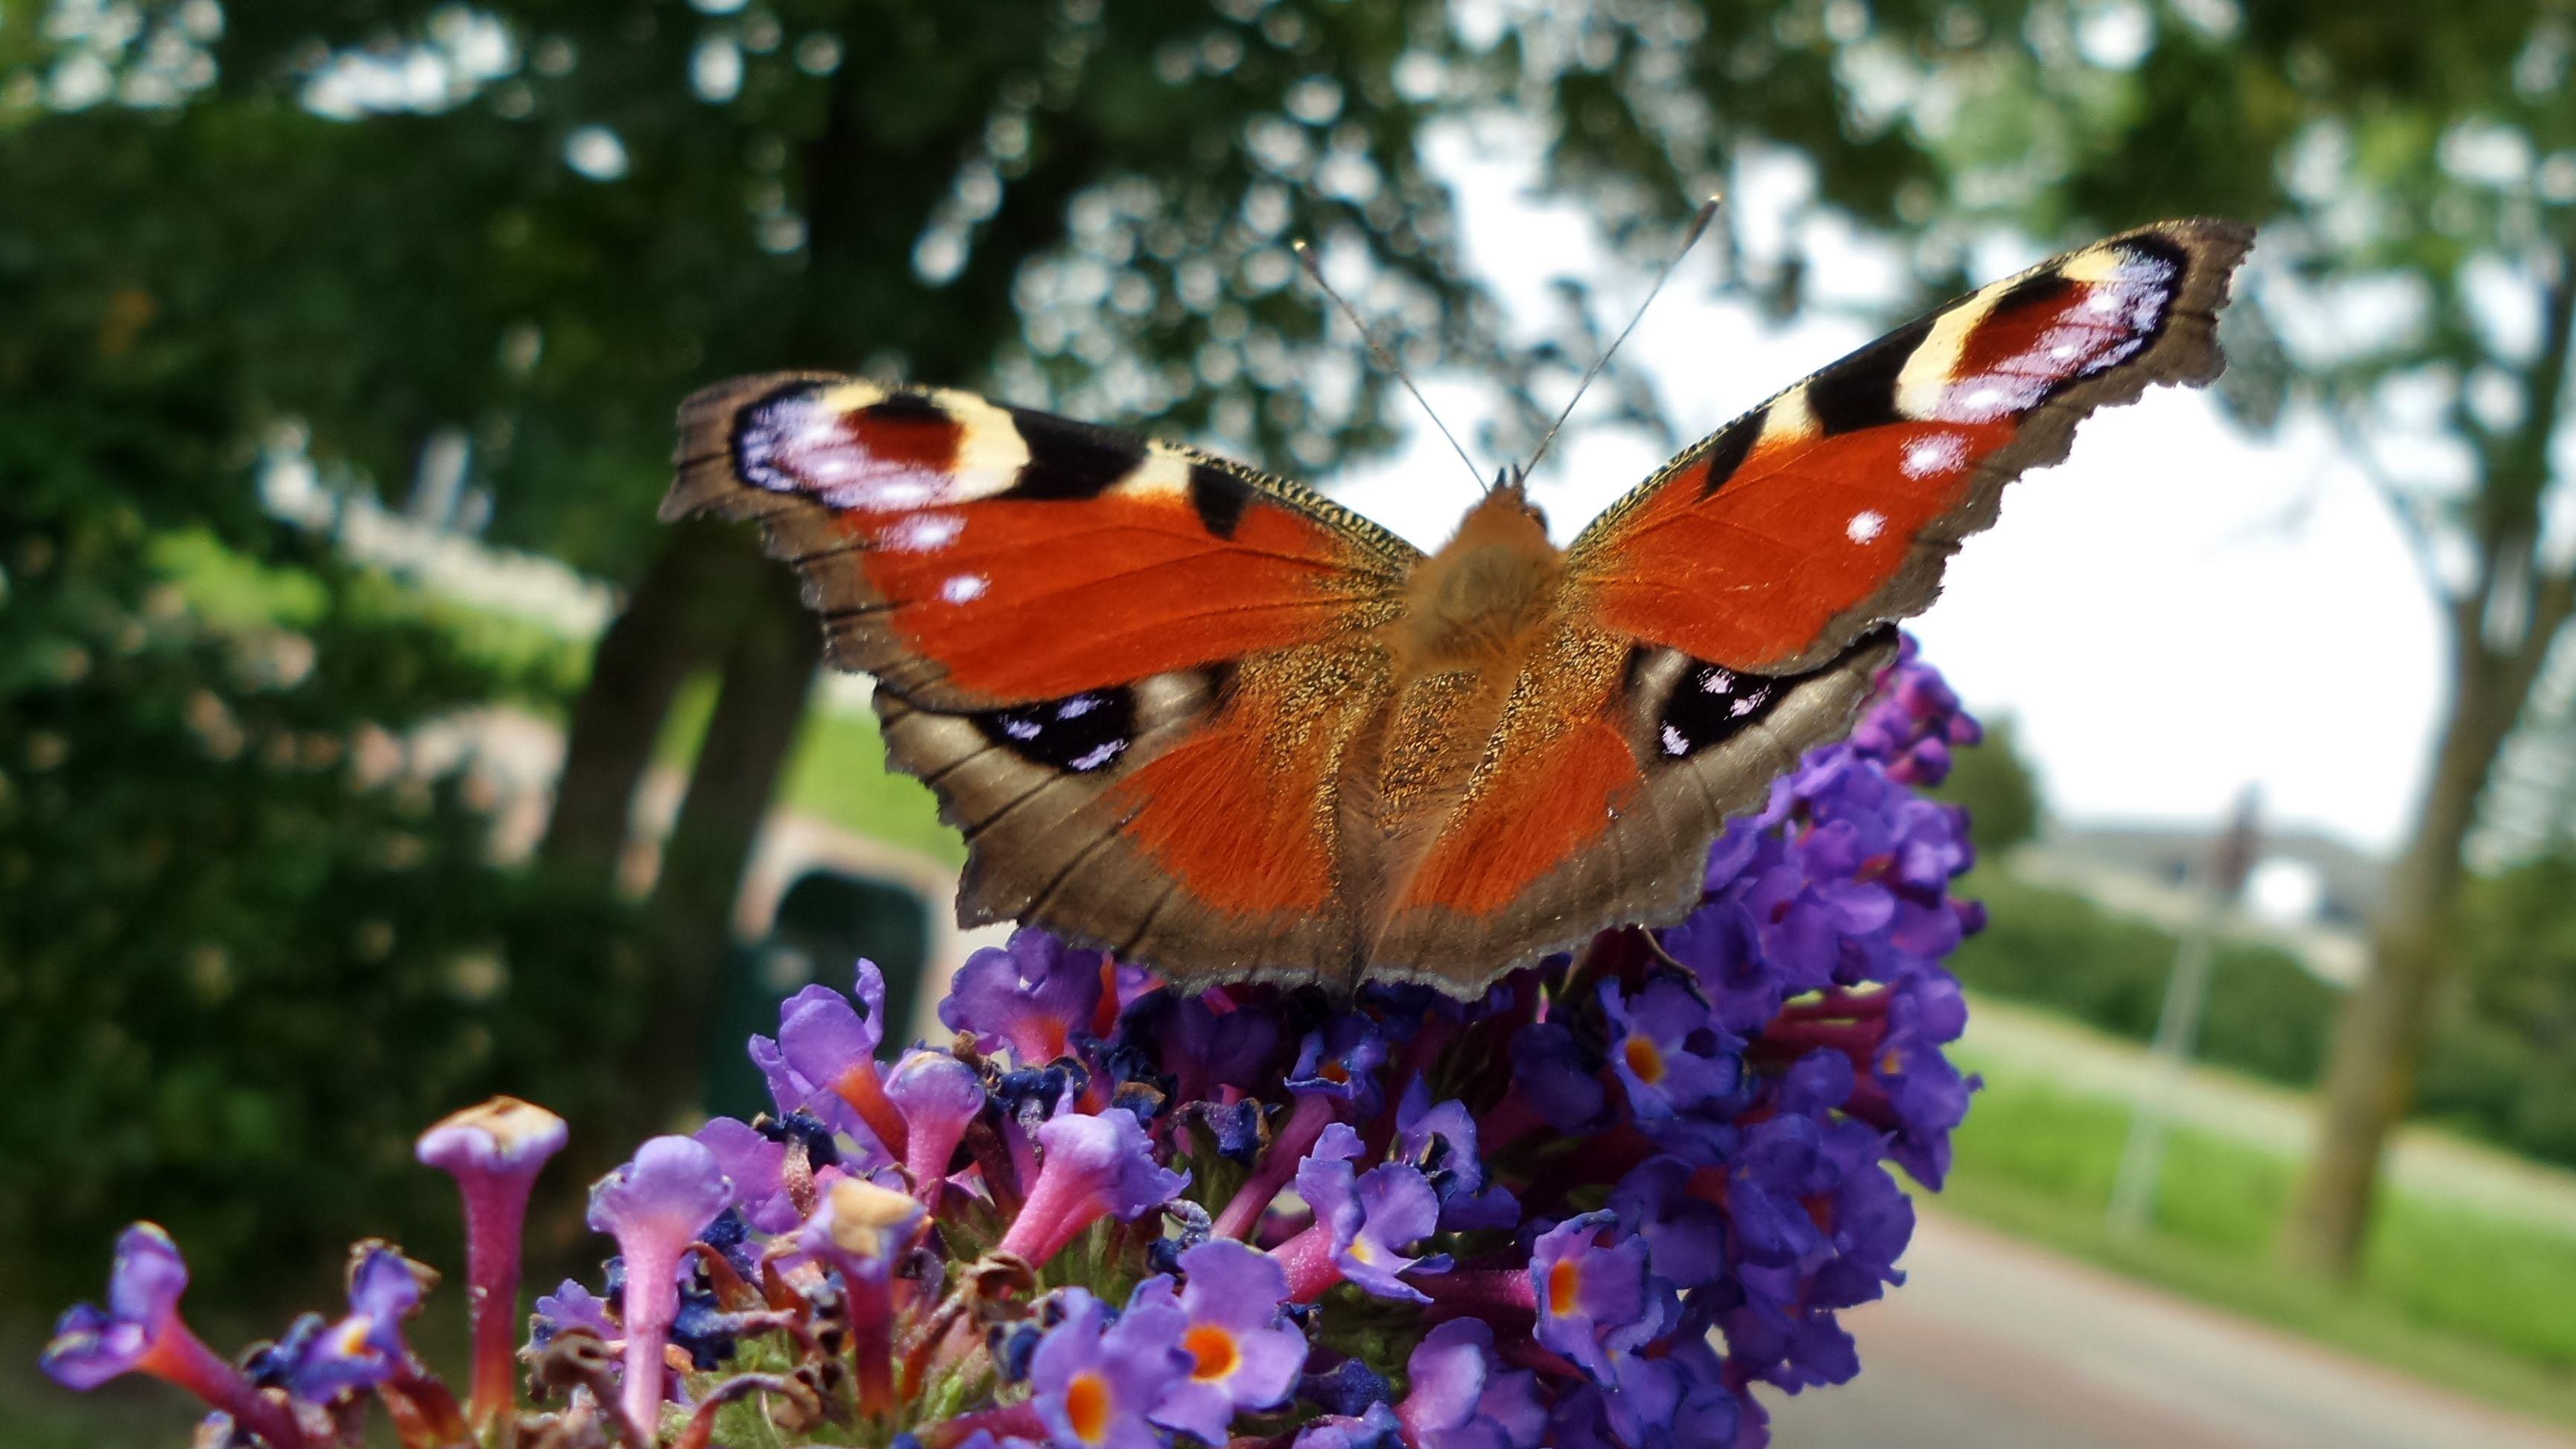 Butterfly, Holland, Stompetoren 2016